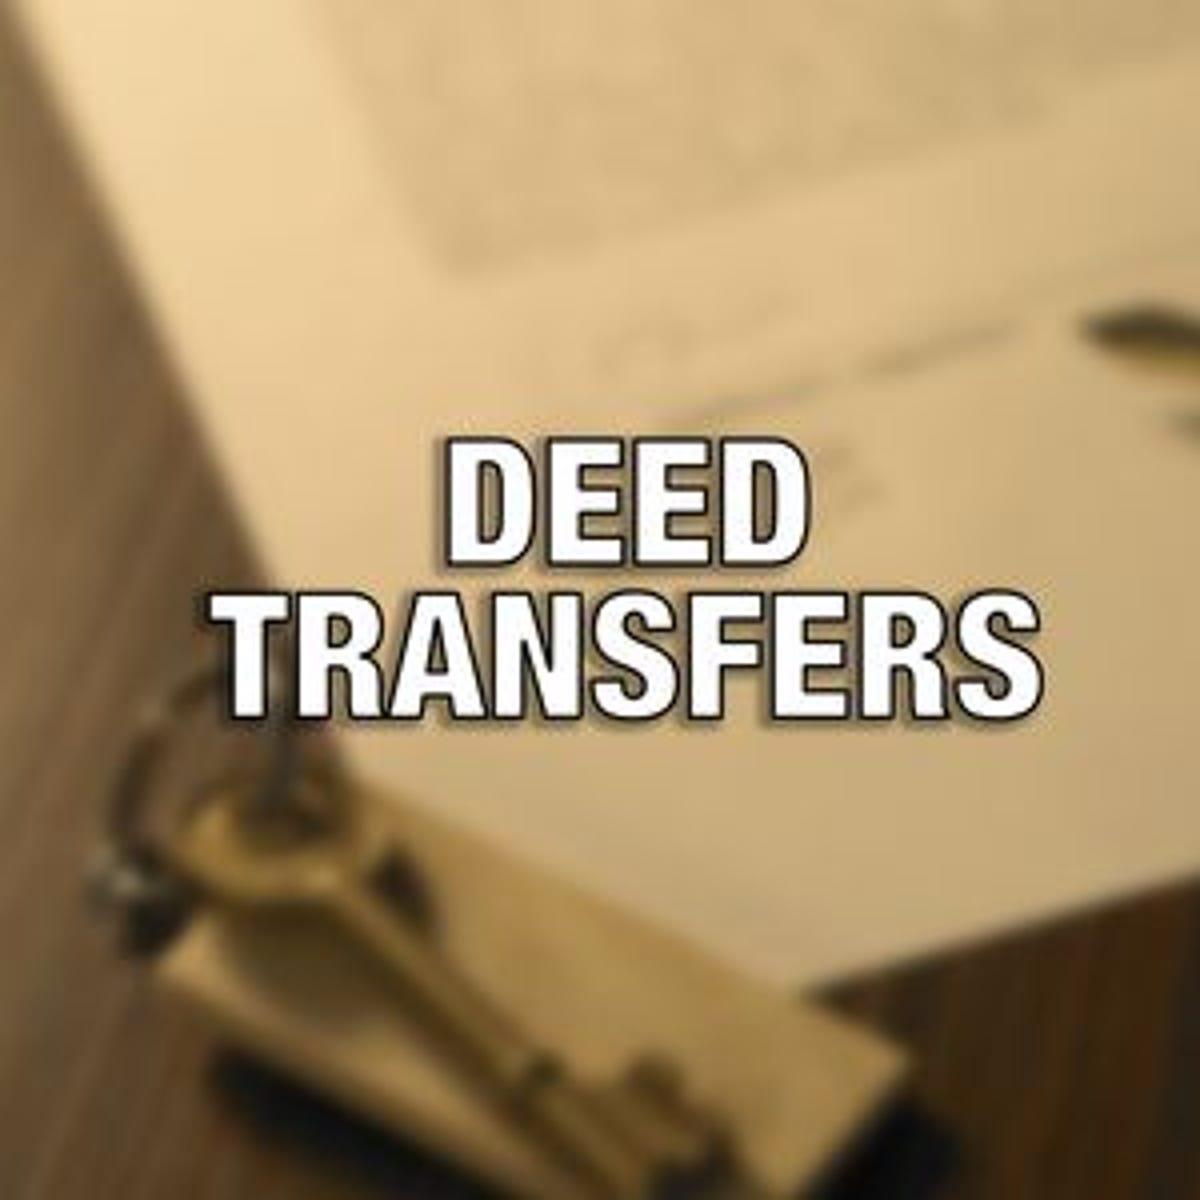 Franklin County deed transfers: Feb  10-16, 2019